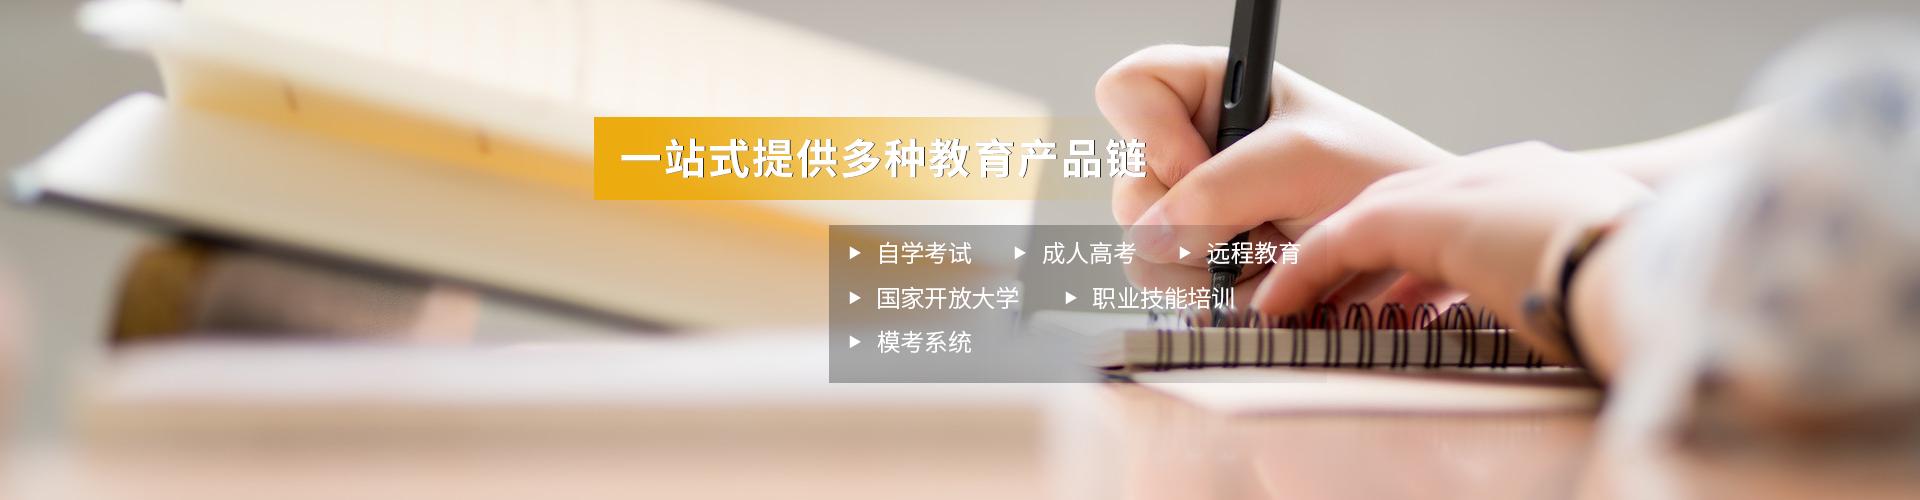 http://www.51shengxue.com/data/upload/202005/20200525104524_791.png